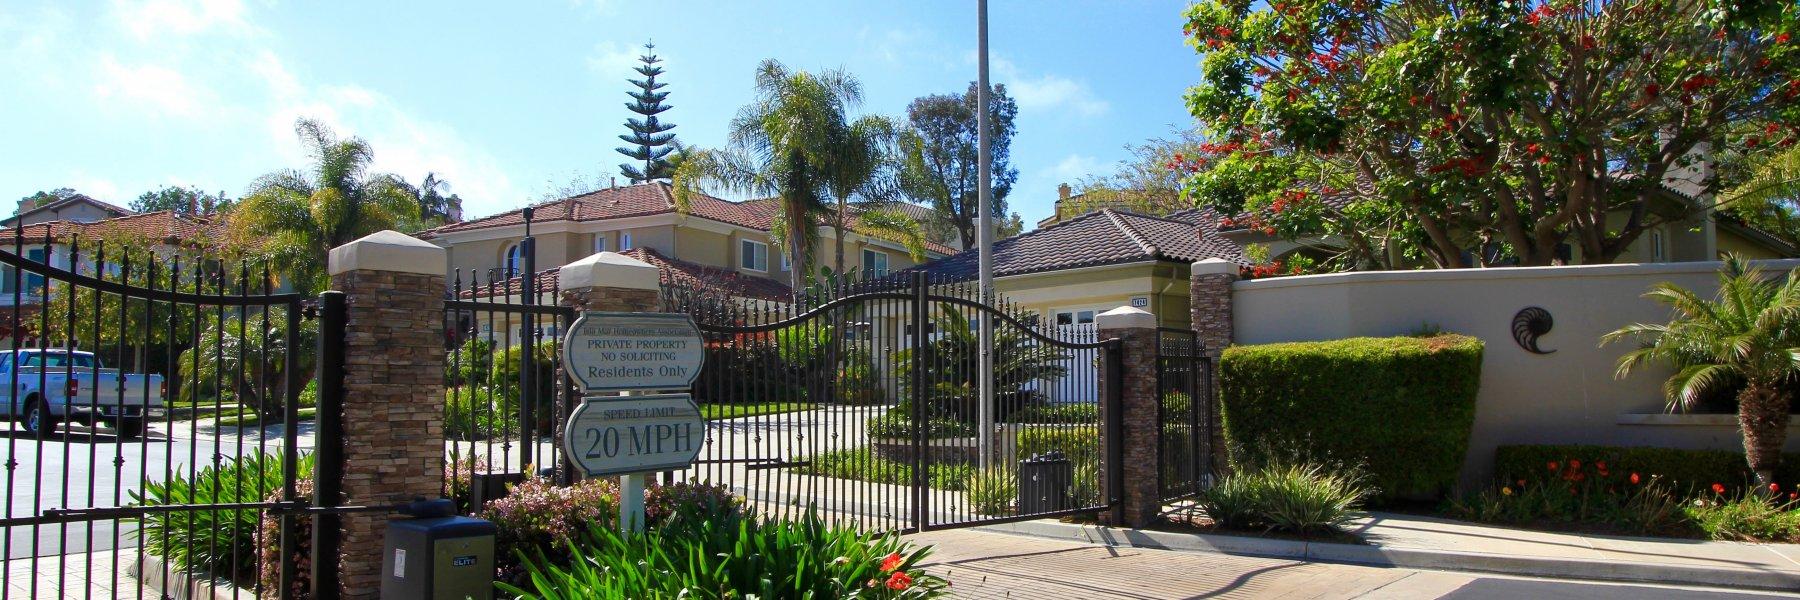 Isla Mar is a community of homes in Carlsbad California